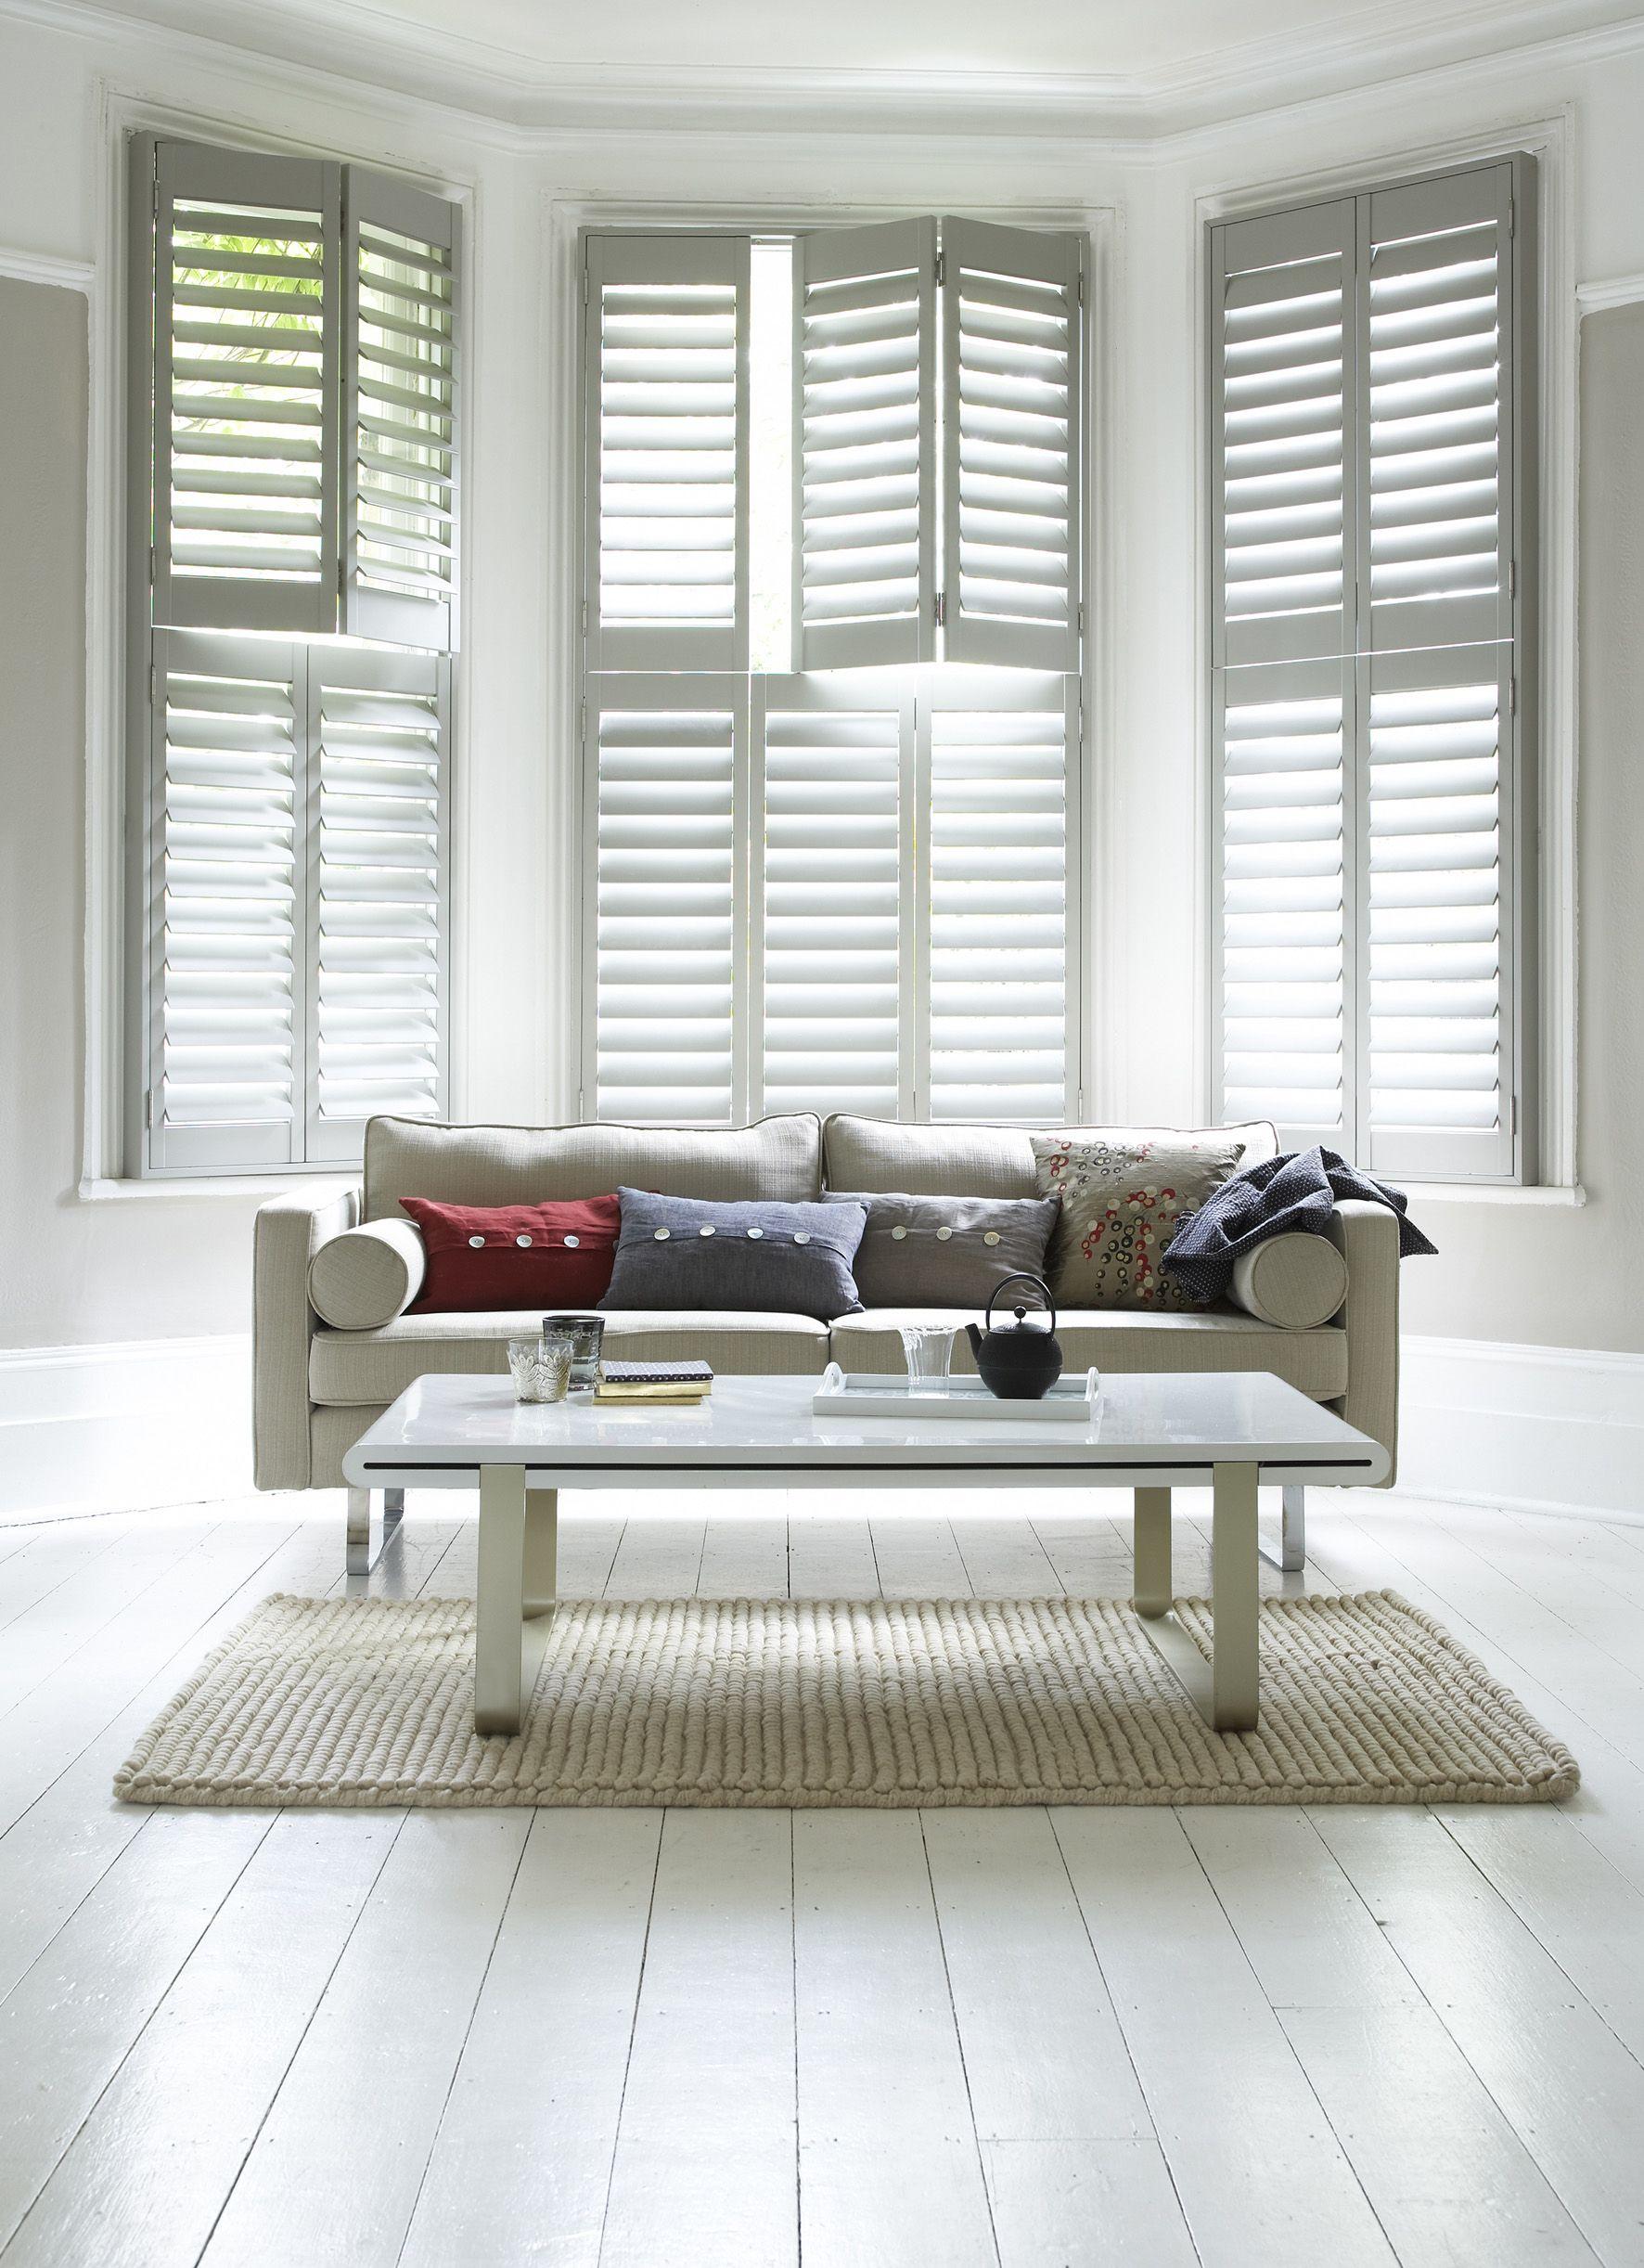 Shutterly fabulous country livin pinterest shutters interior